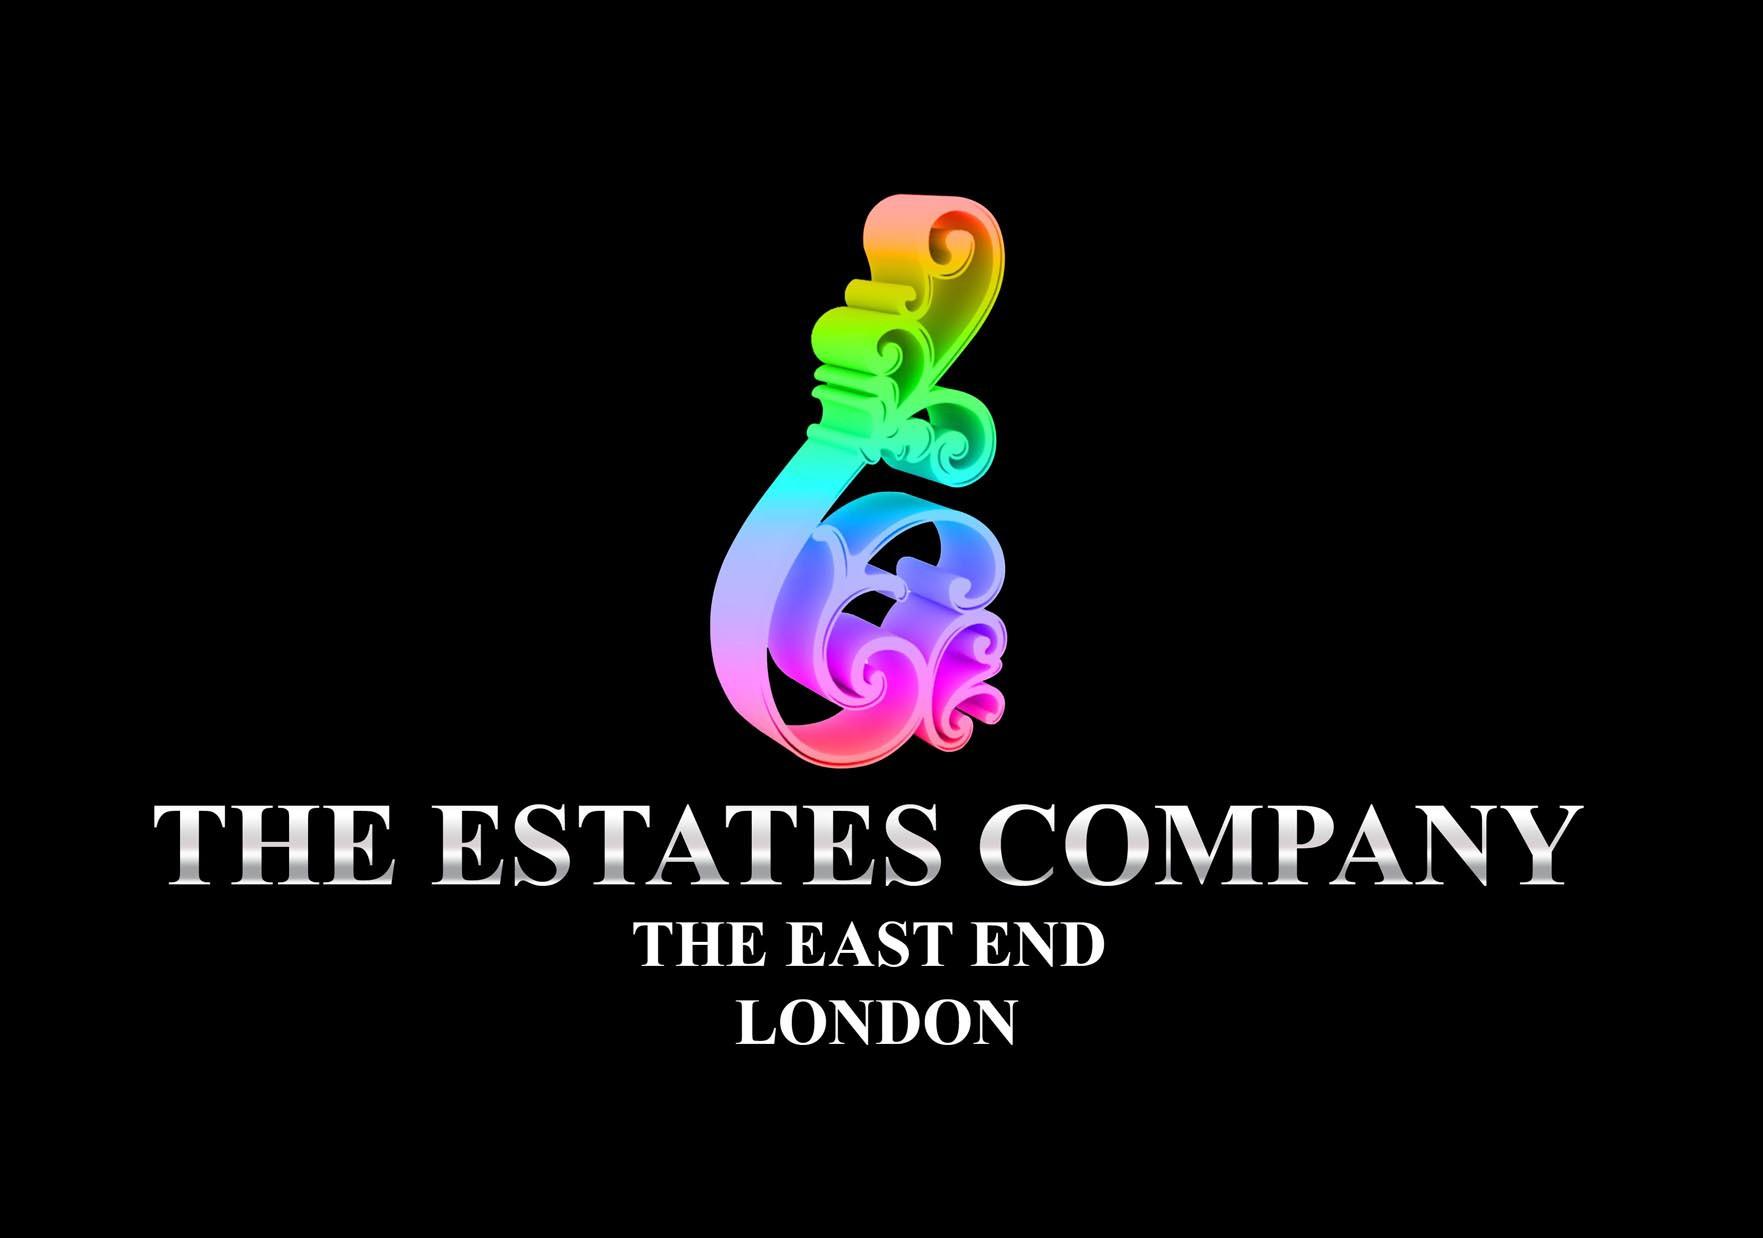 logo for The Estates Company